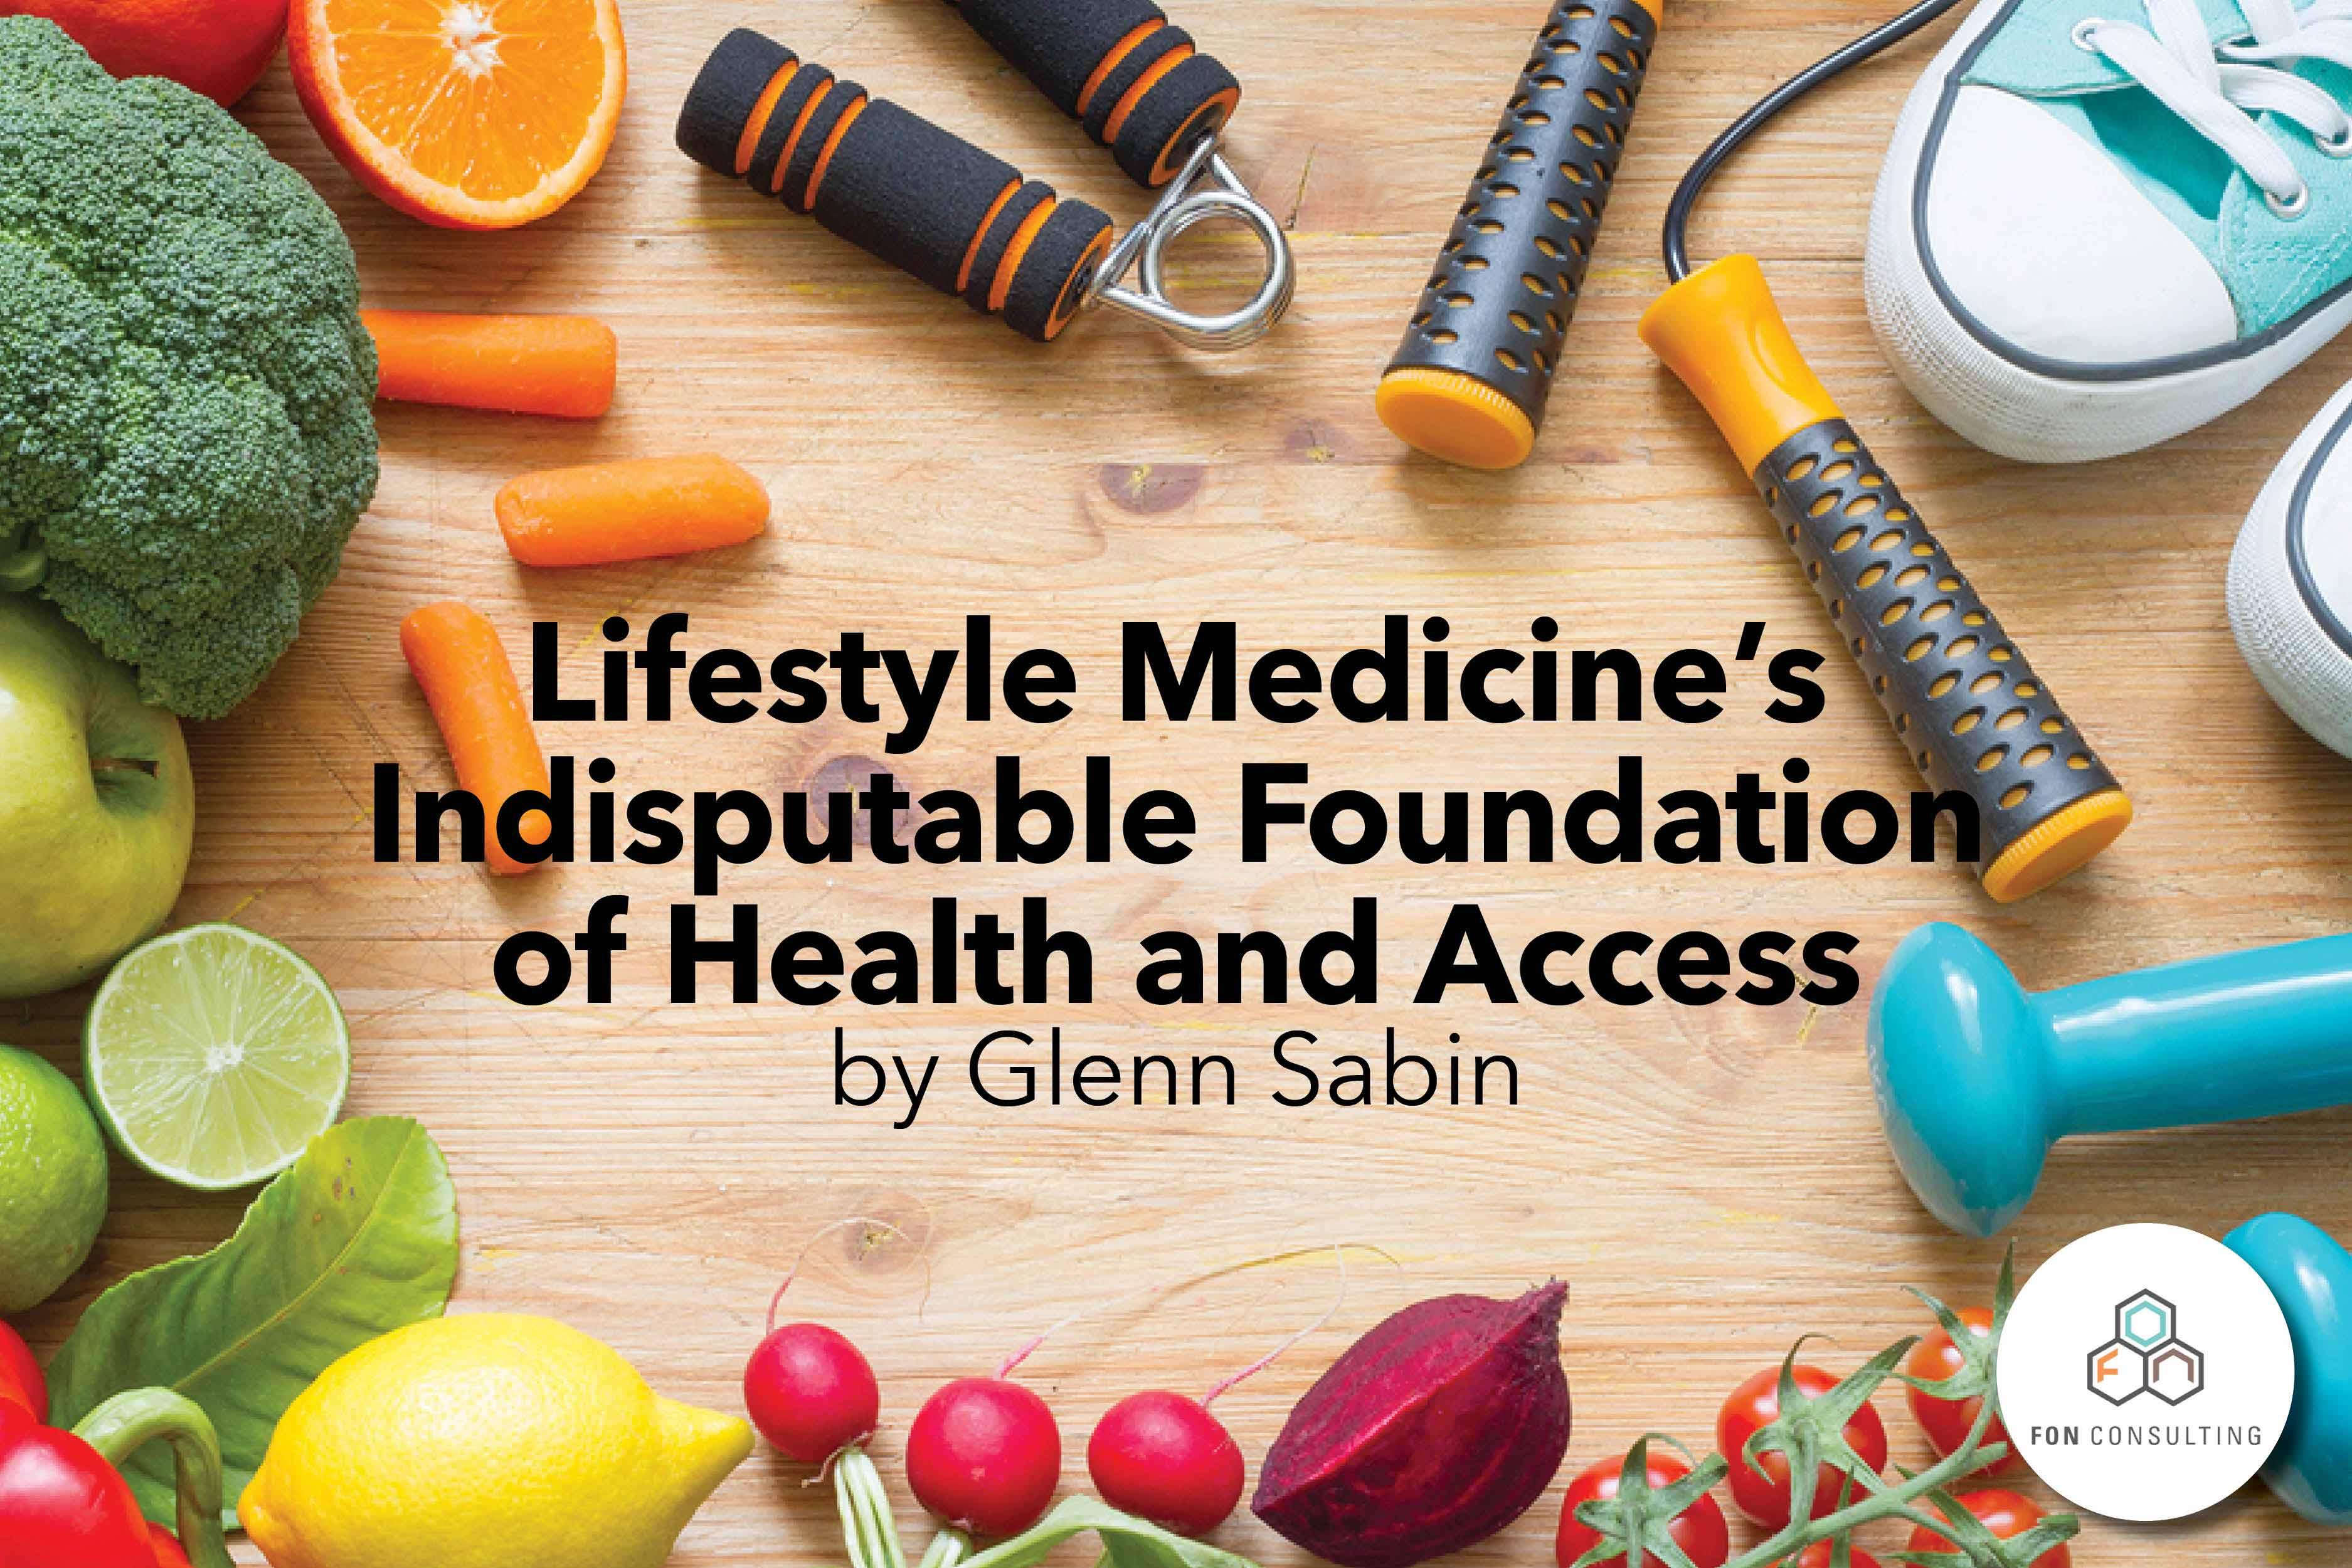 Indisputable Foundation of Health